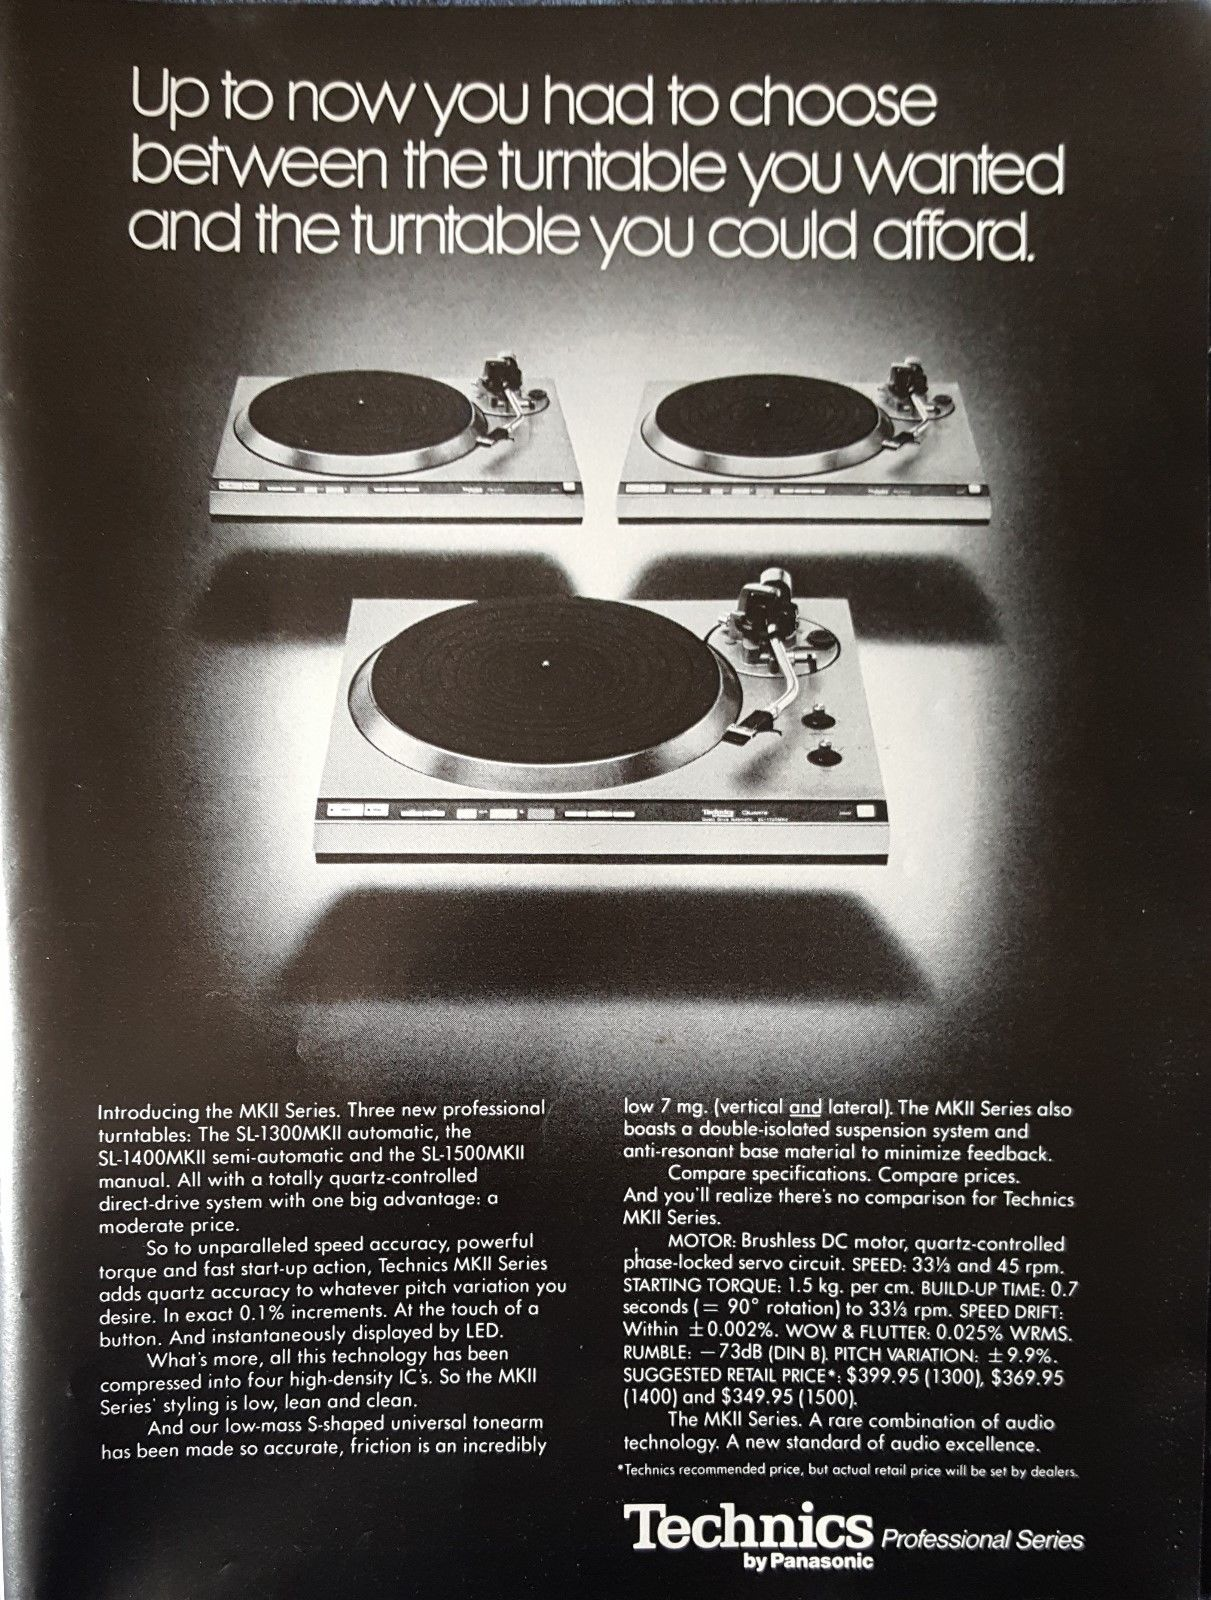 Print ad circa 1977.